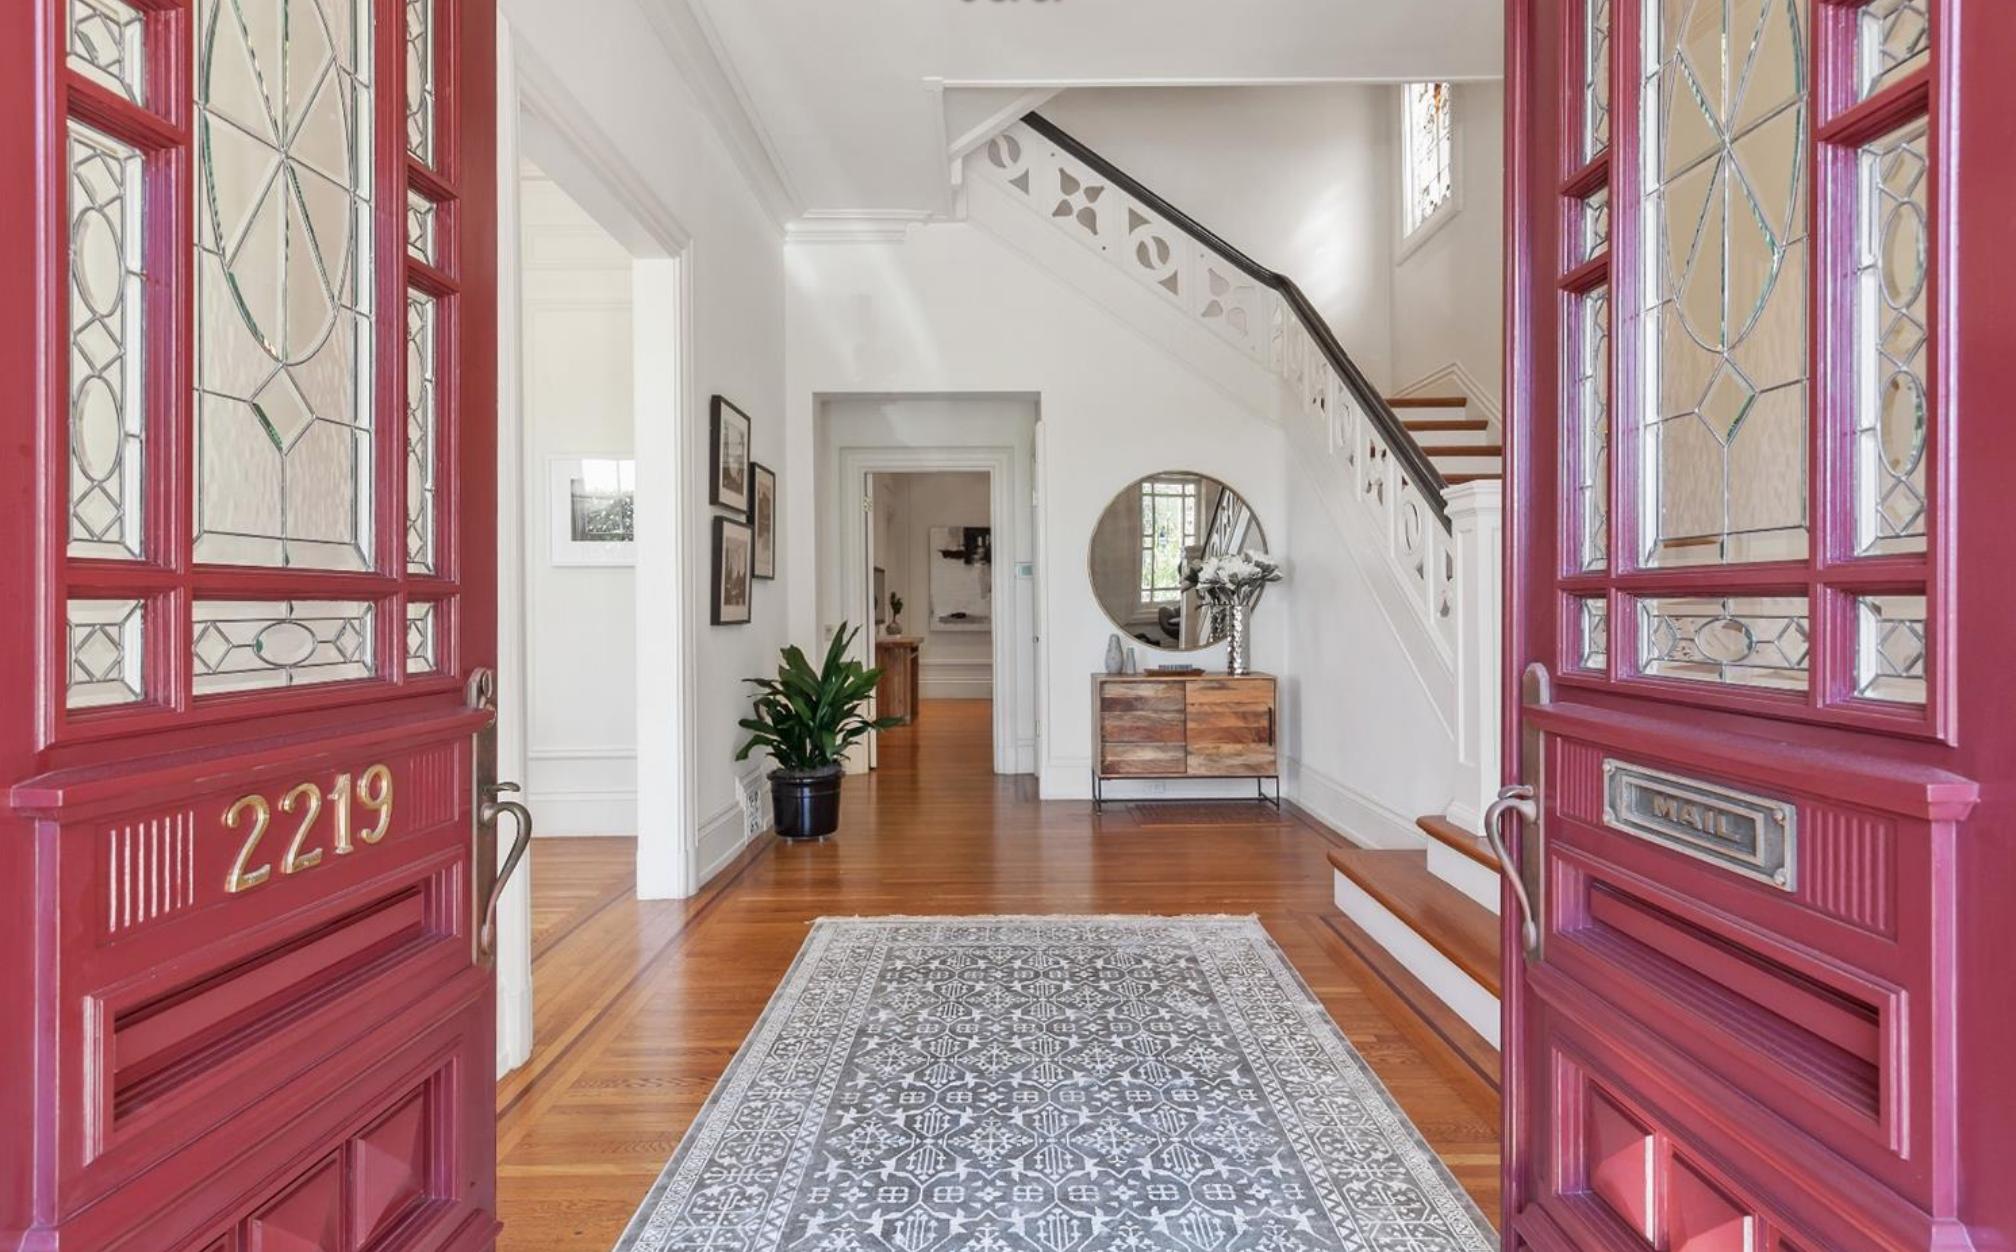 2219 Scott Street - Entrance